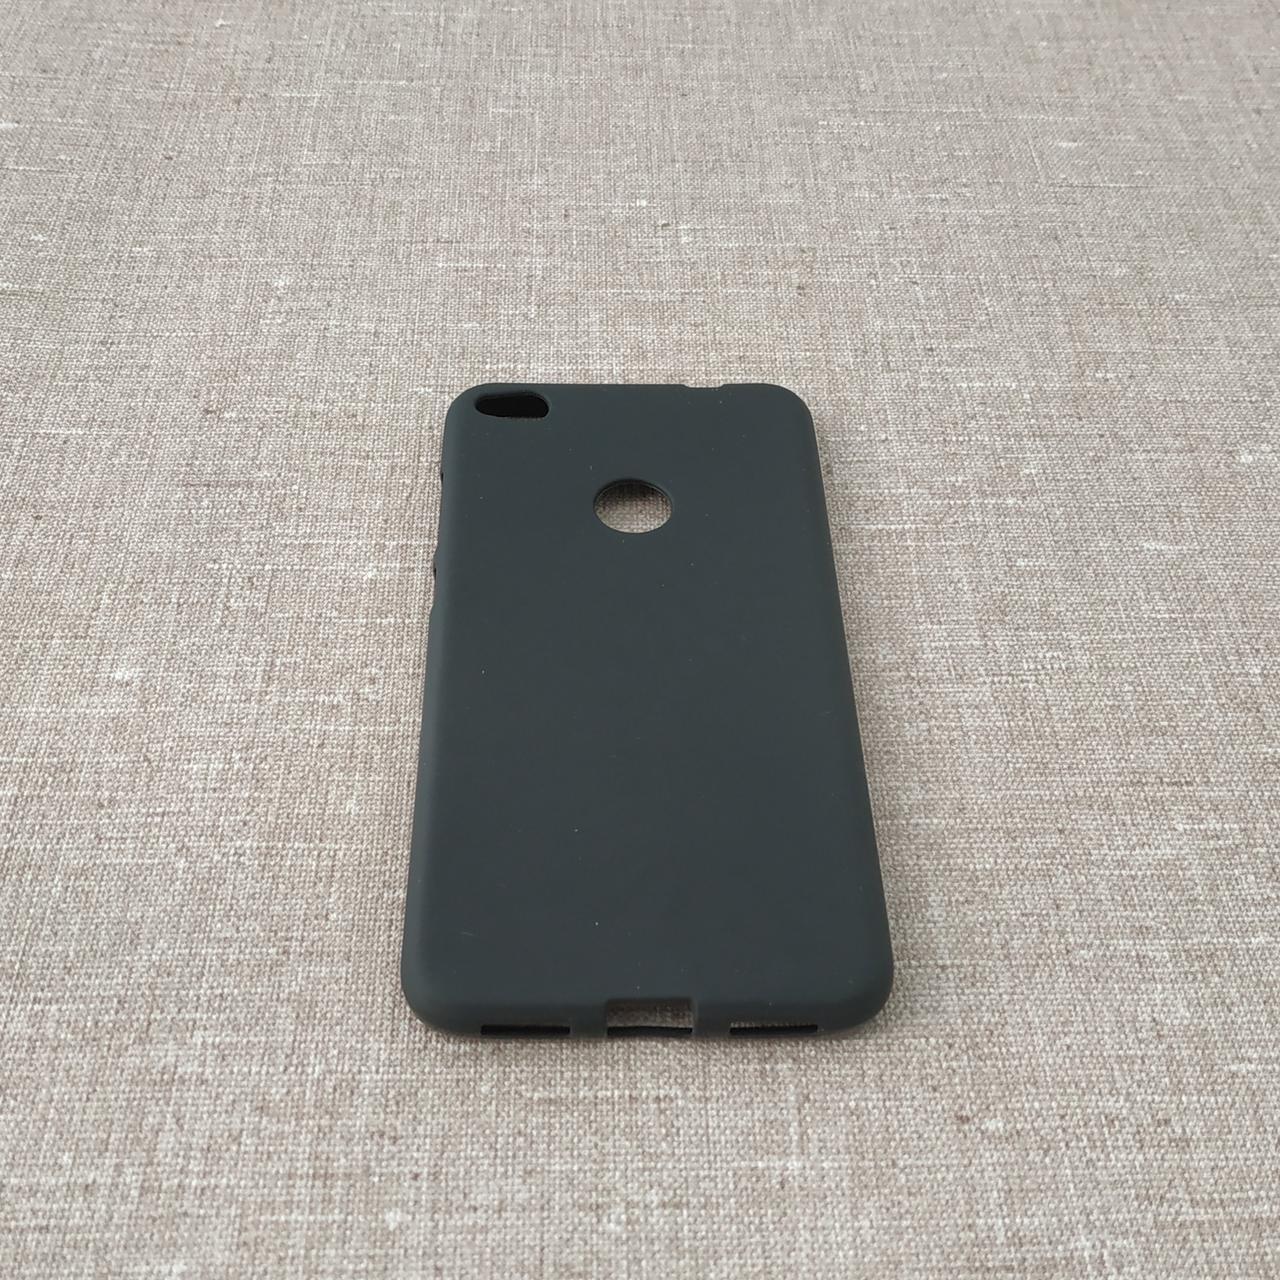 Чехлы для Huawei TPU P8 Lite 2017 black